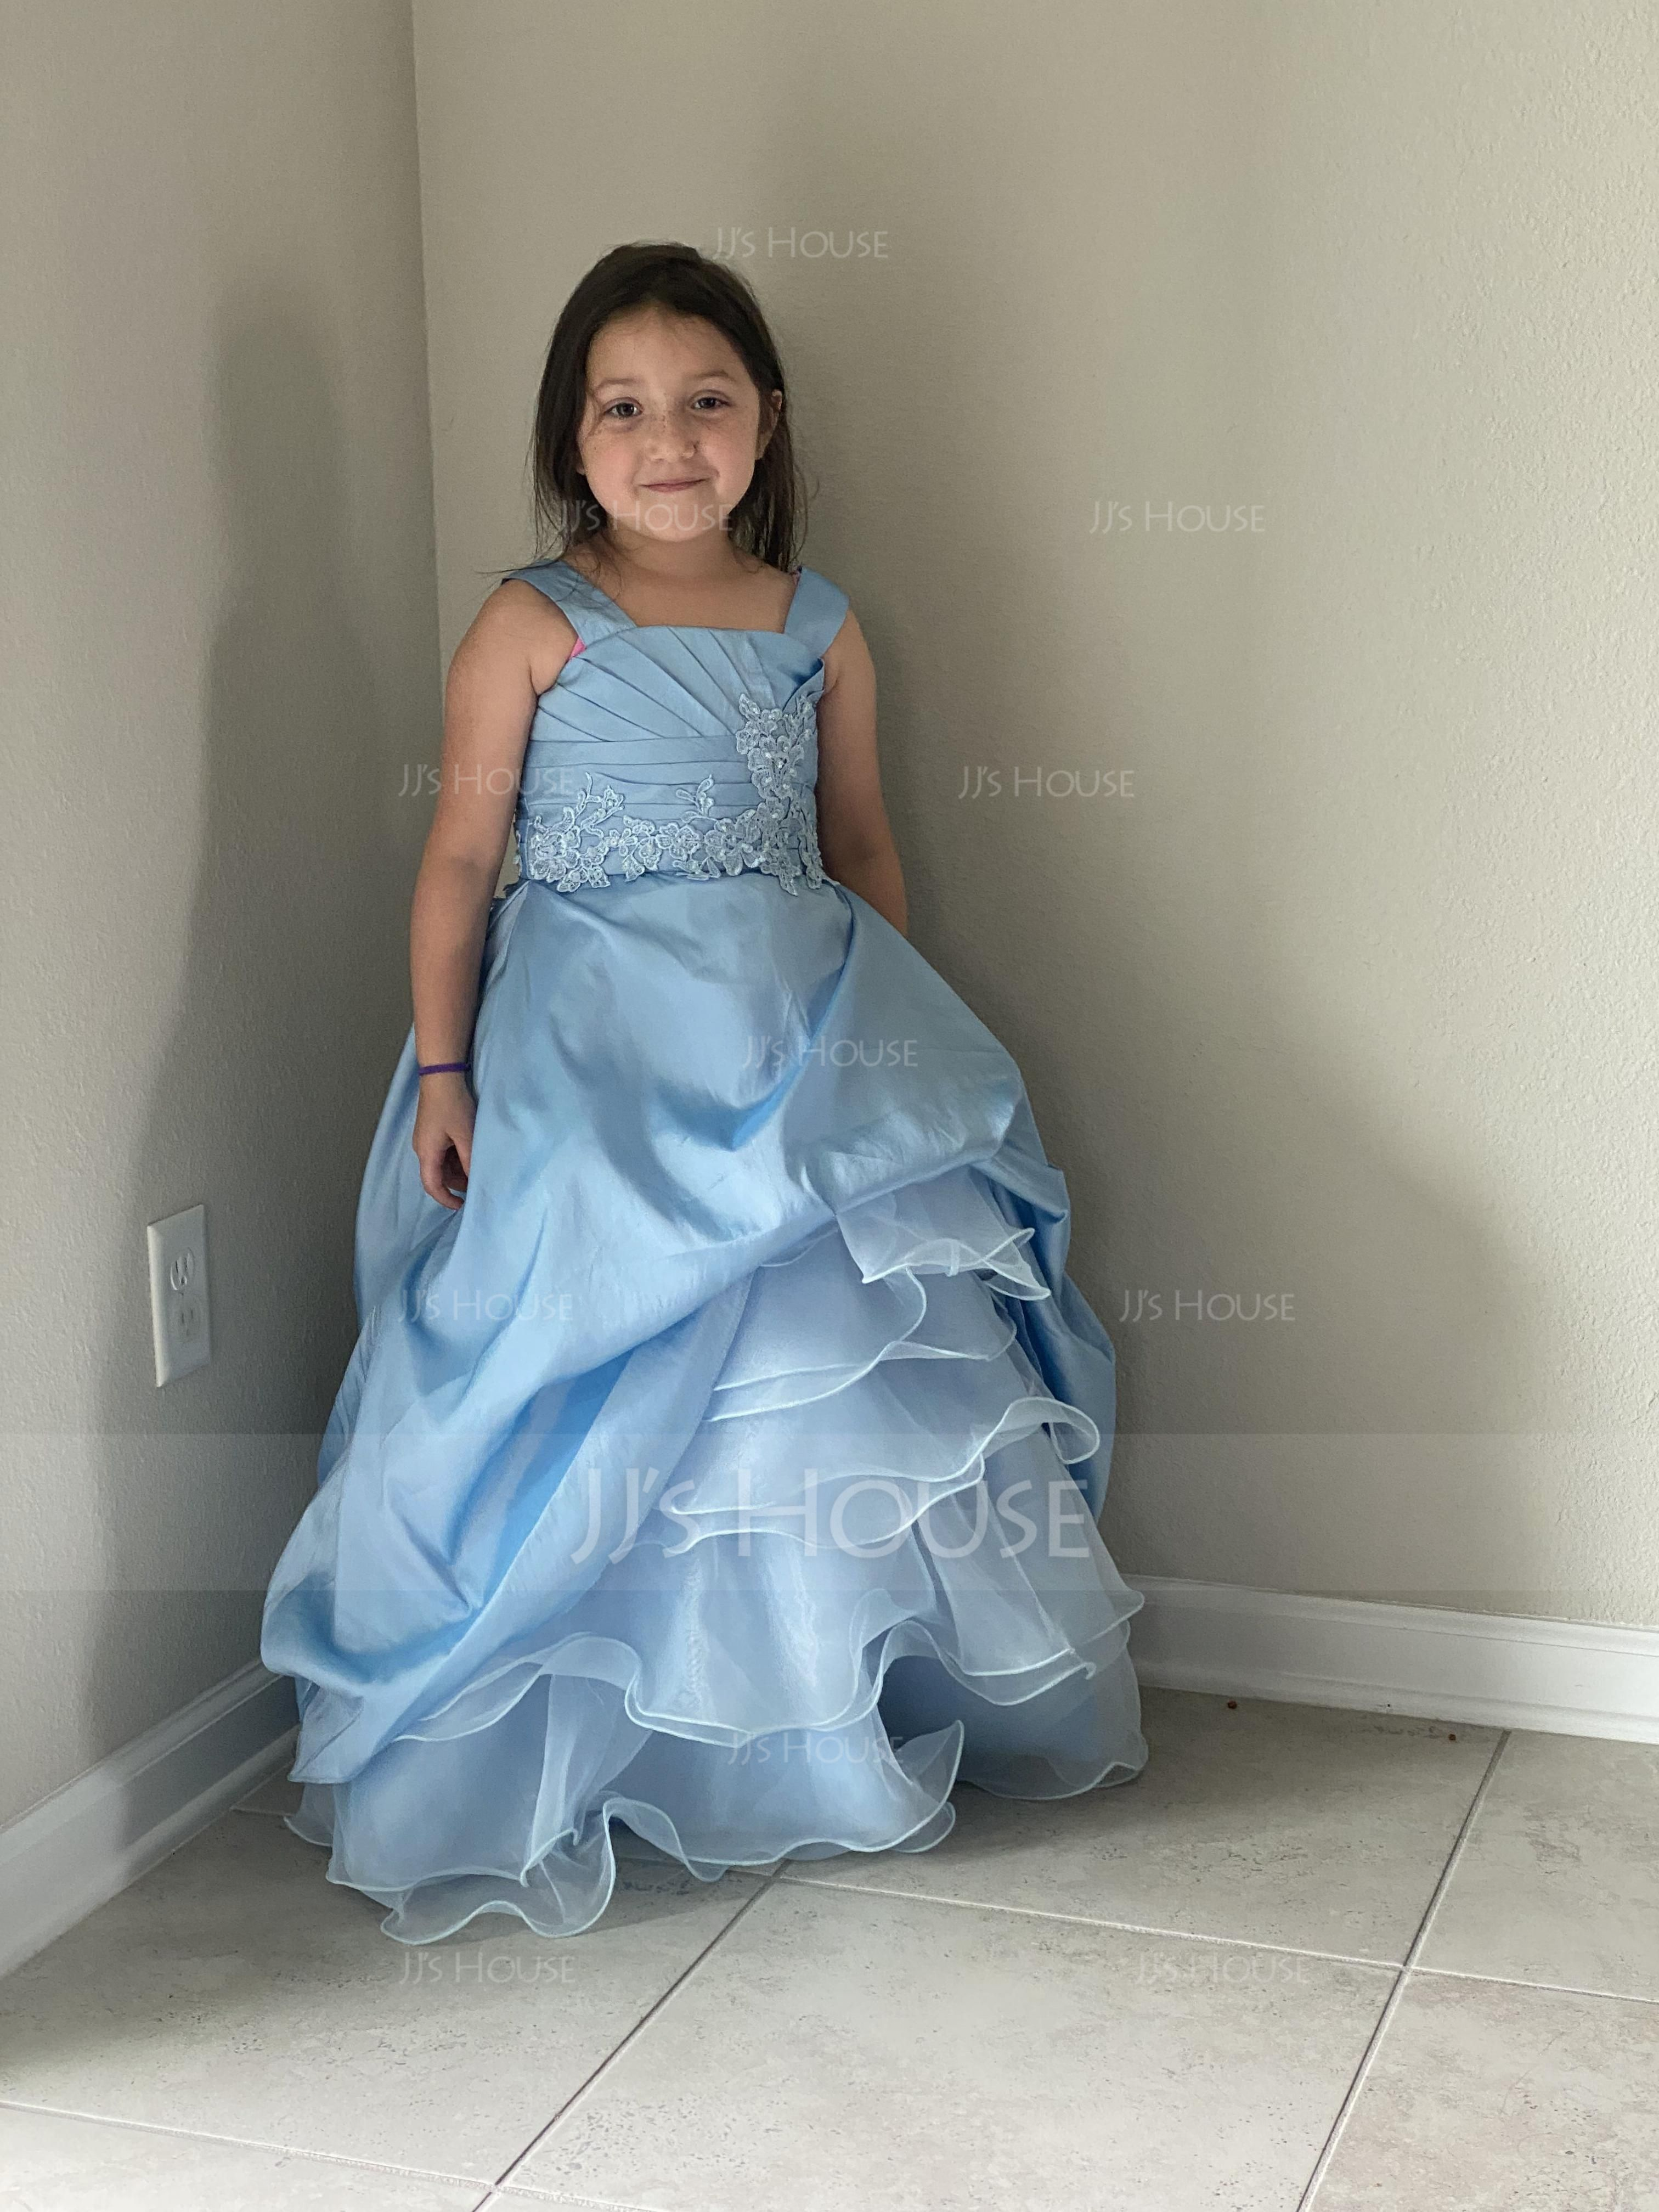 Ball Gown Floor-length Flower Girl Dress - Taffeta/Organza Sleeveless Straps With Ruffles/Beading/Appliques/Pick Up Skirt (010005784)